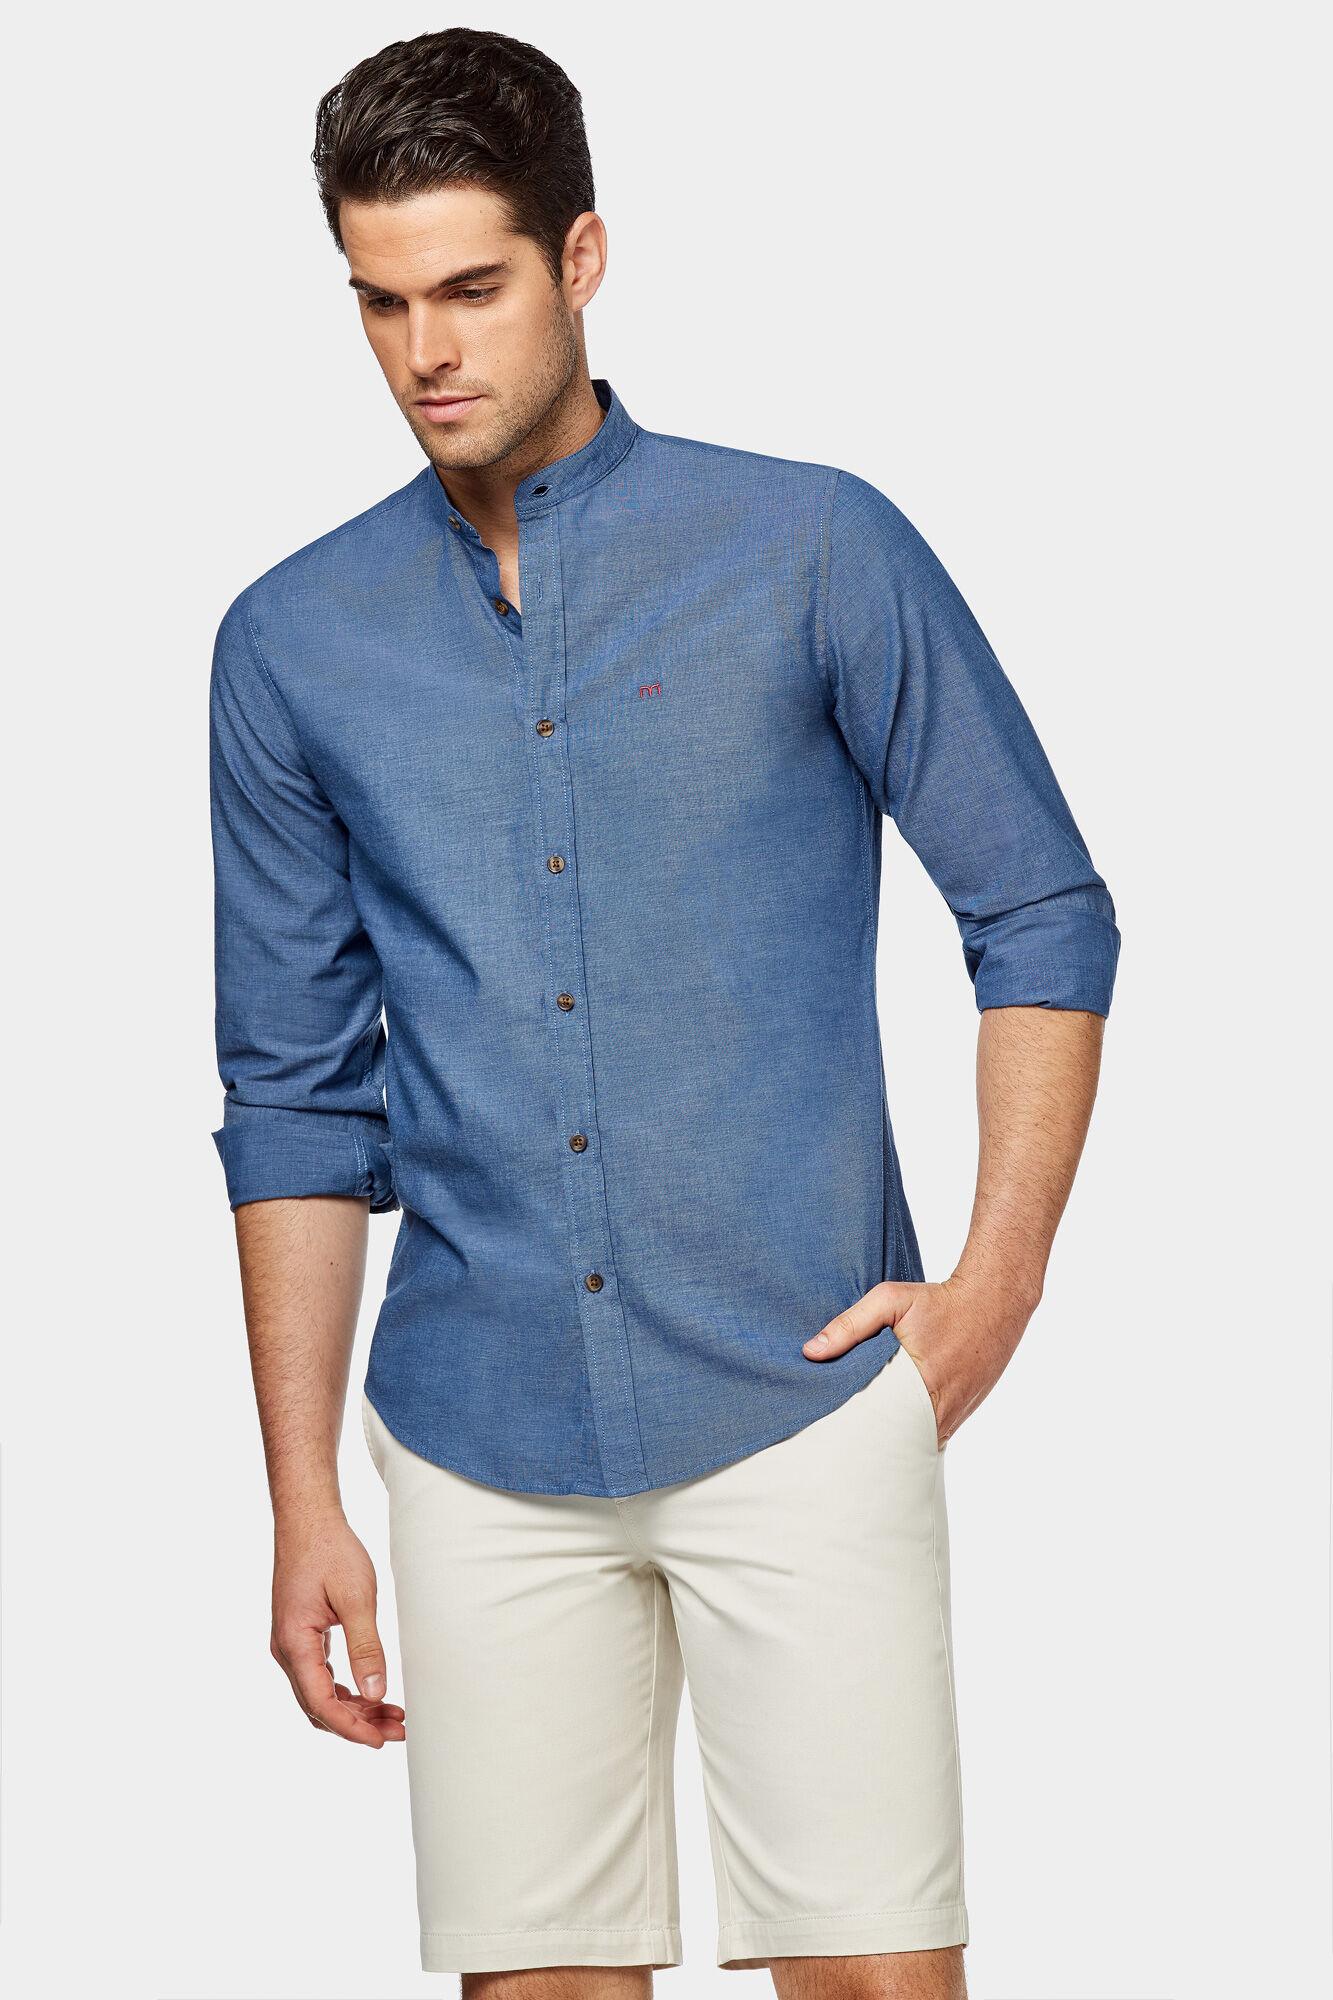 Camisa Q7xs7piw Mao Fifty Cuello Camisas TlKFcJ31